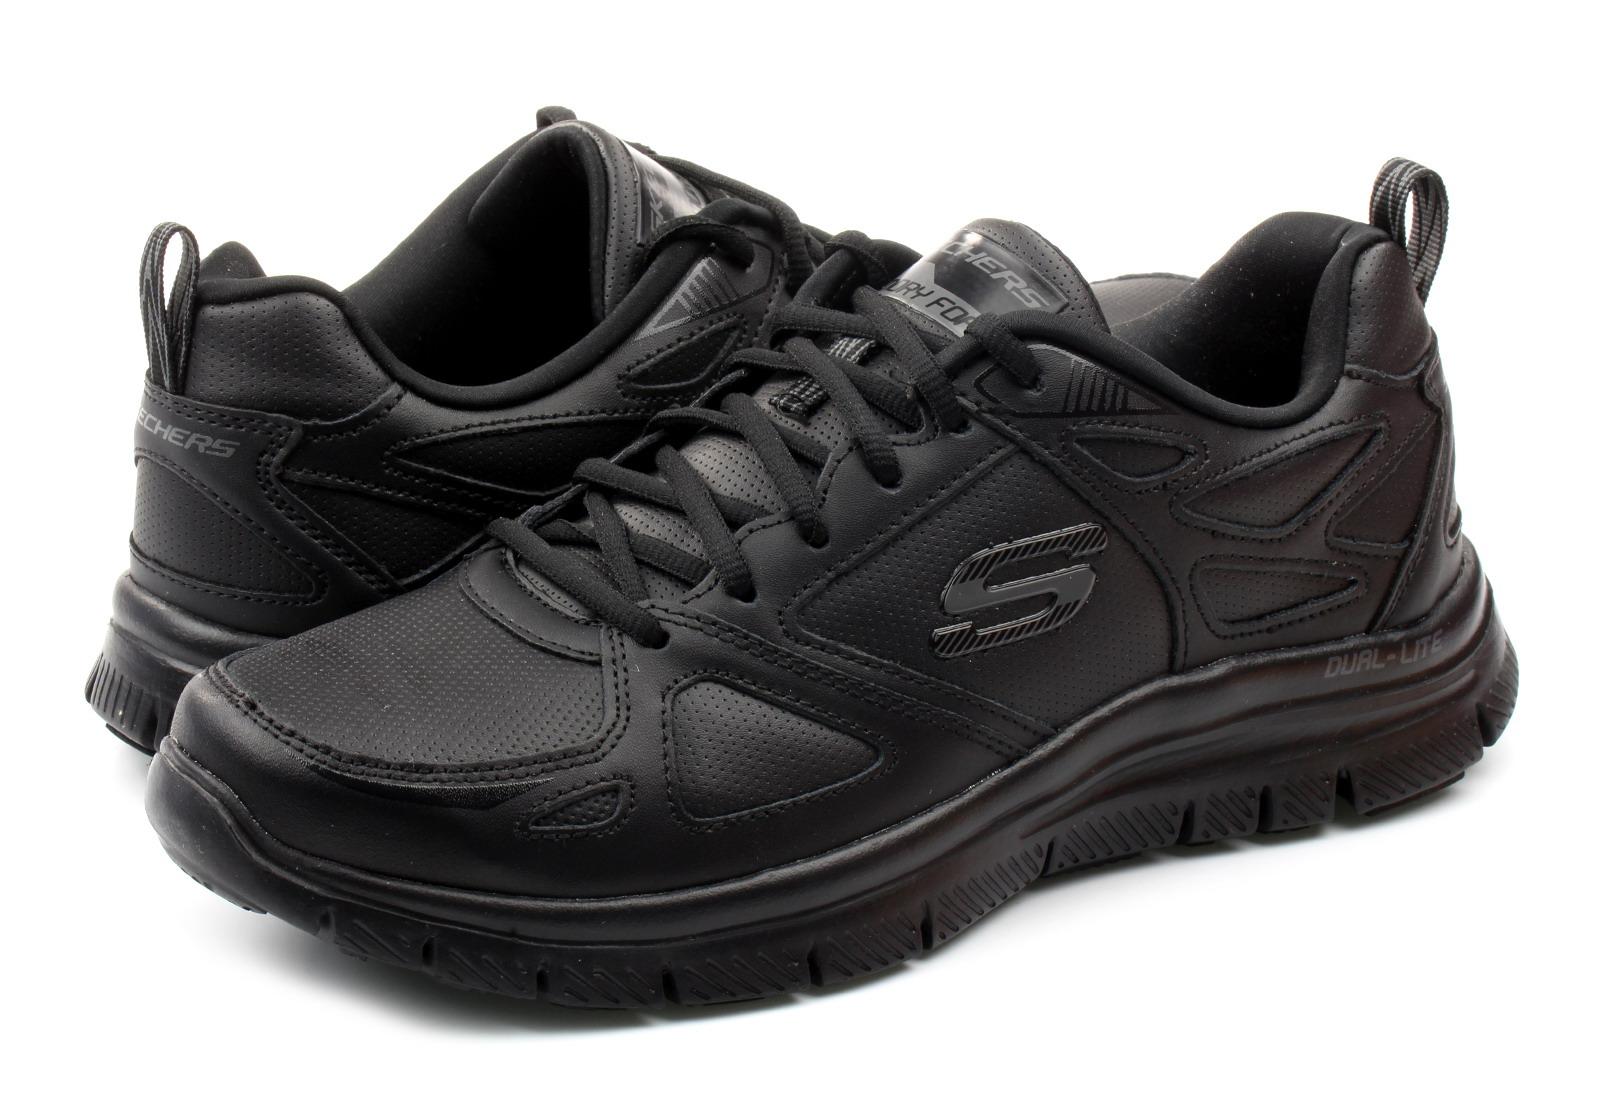 For Bbk Strength Online SneakersAnd Even Shop Shoes Advantage Boots 51461 Flex Skechers Kc3TFJlu1